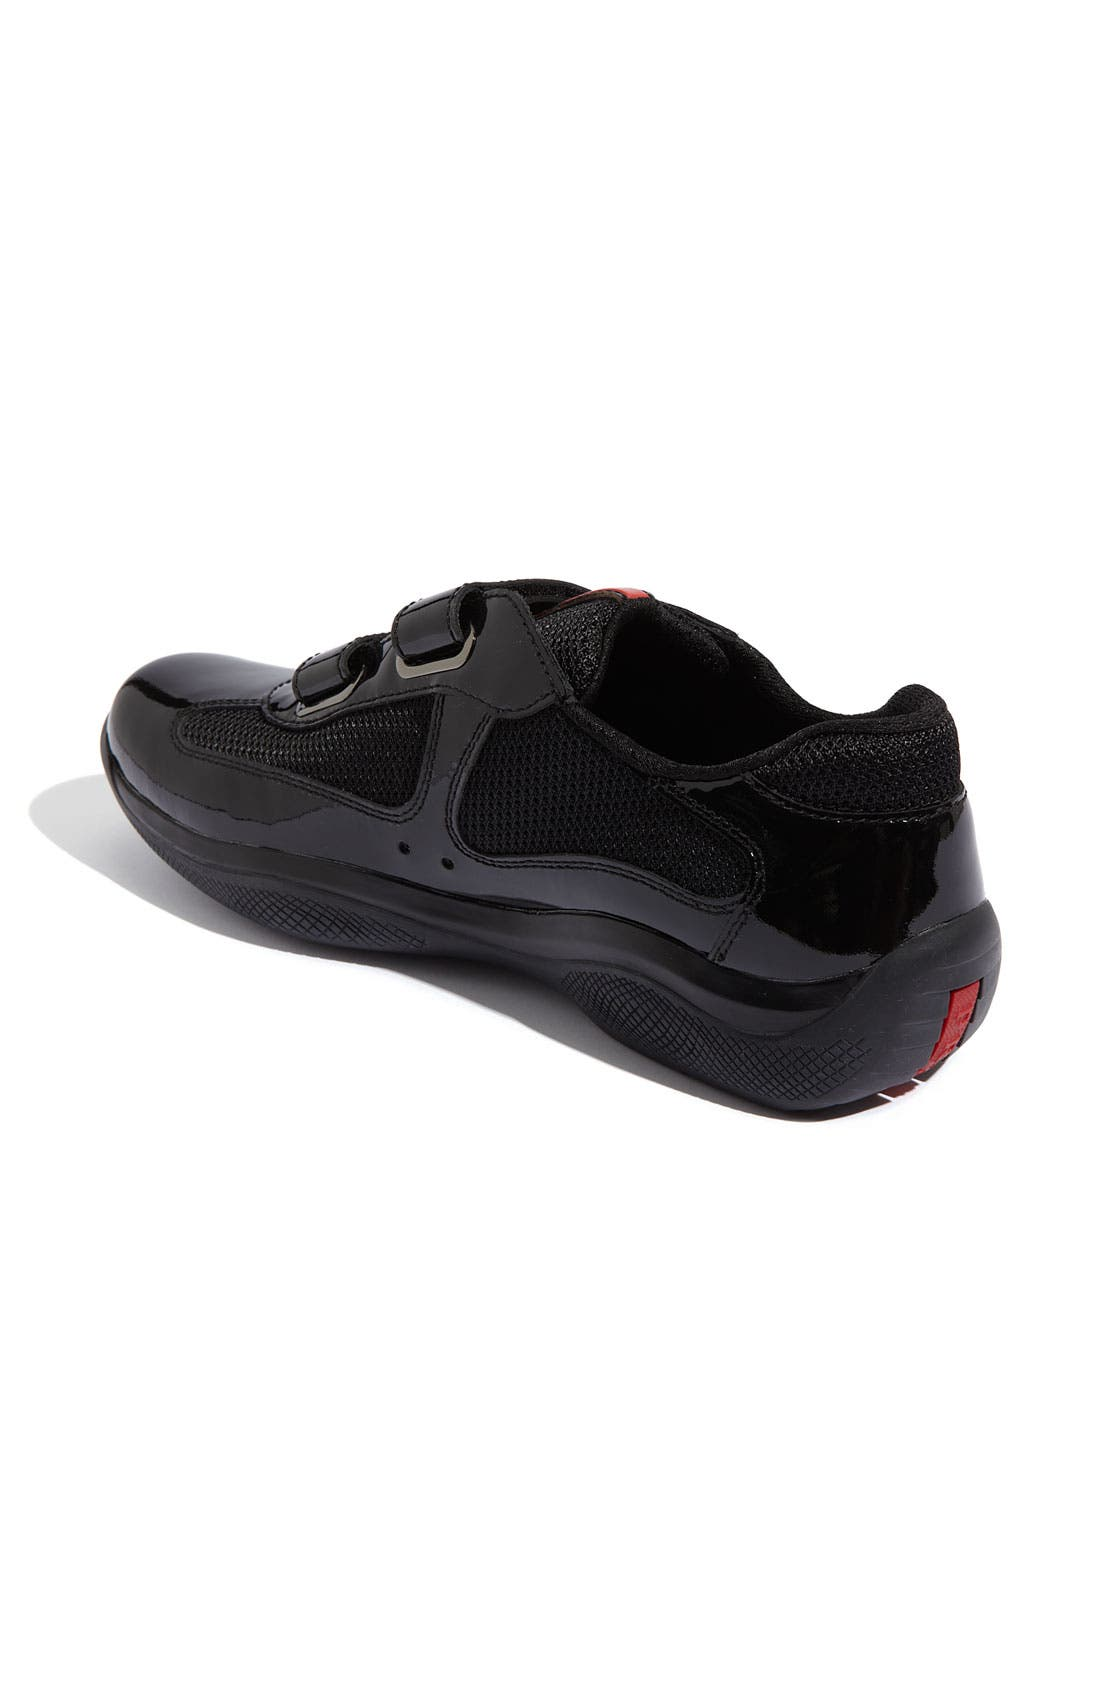 Alternate Image 2  - Prada 'America's Cup' Patent Leather Sneaker